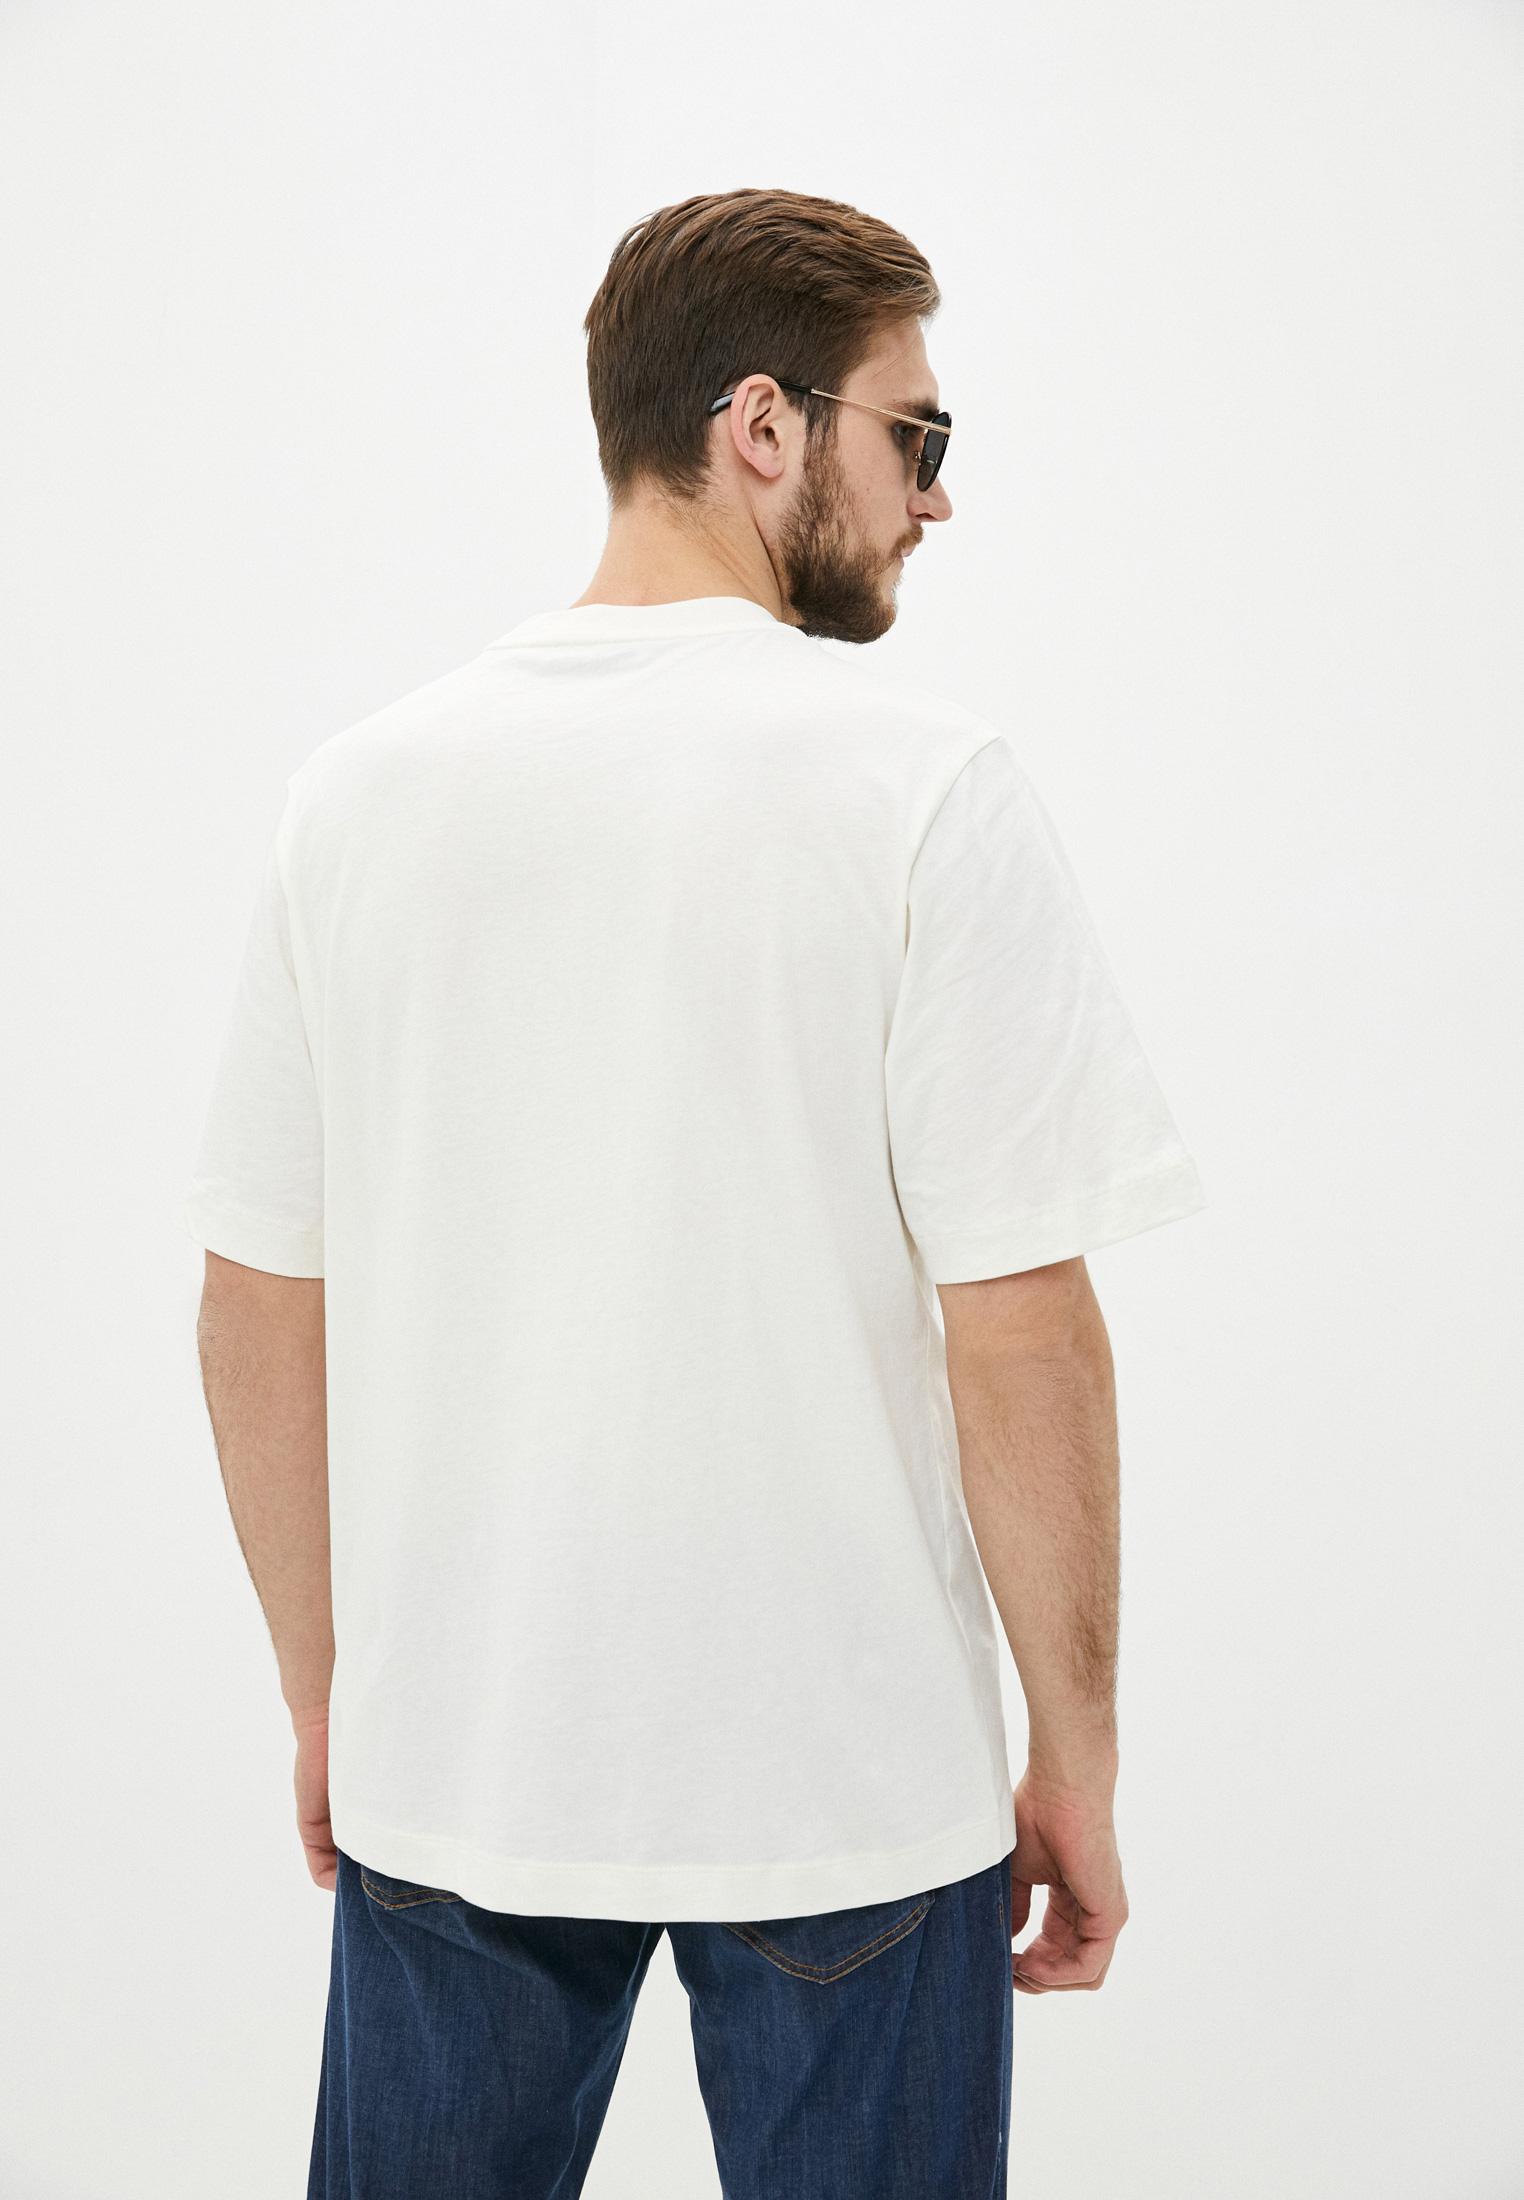 Мужская футболка Trussardi (Труссарди) 52T00455-1T005053: изображение 4